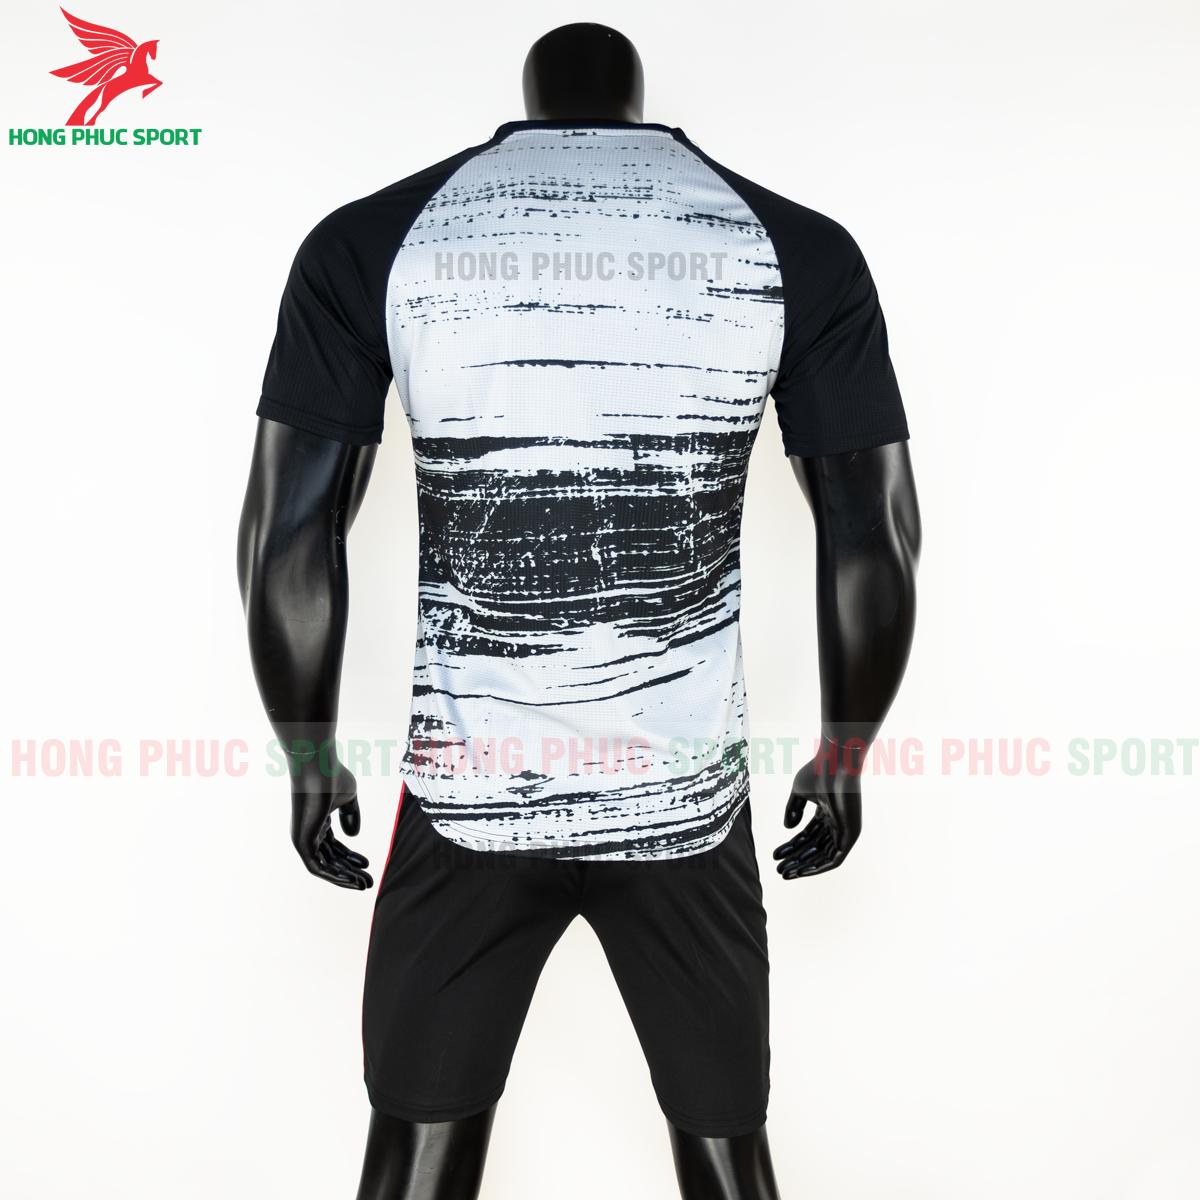 https://cdn.hongphucsport.com/unsafe/s4.shopbay.vn/files/285/ao-bong-da-bayern-munich-2020-2021-pre-match-hang-thailand-8-5f8febfe17629.png